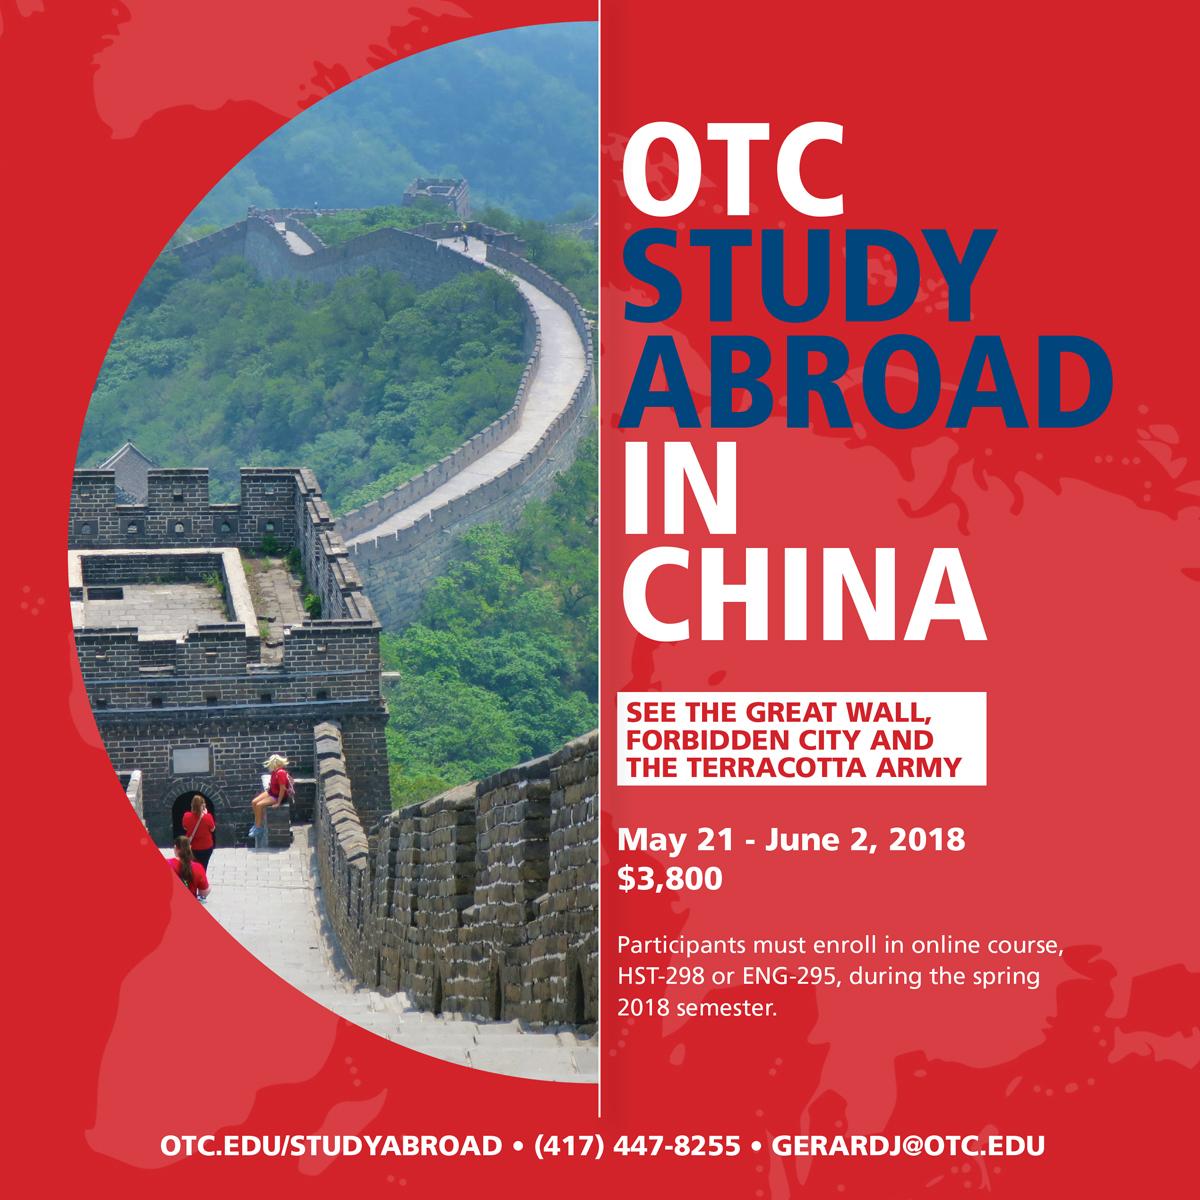 StudyAbroad_ChinaSM